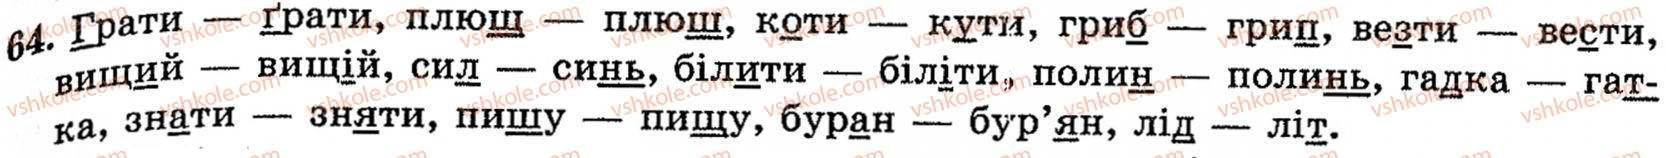 10-ukrayinska-mova-ov-zabolotnij-vv-zabolotnij-64